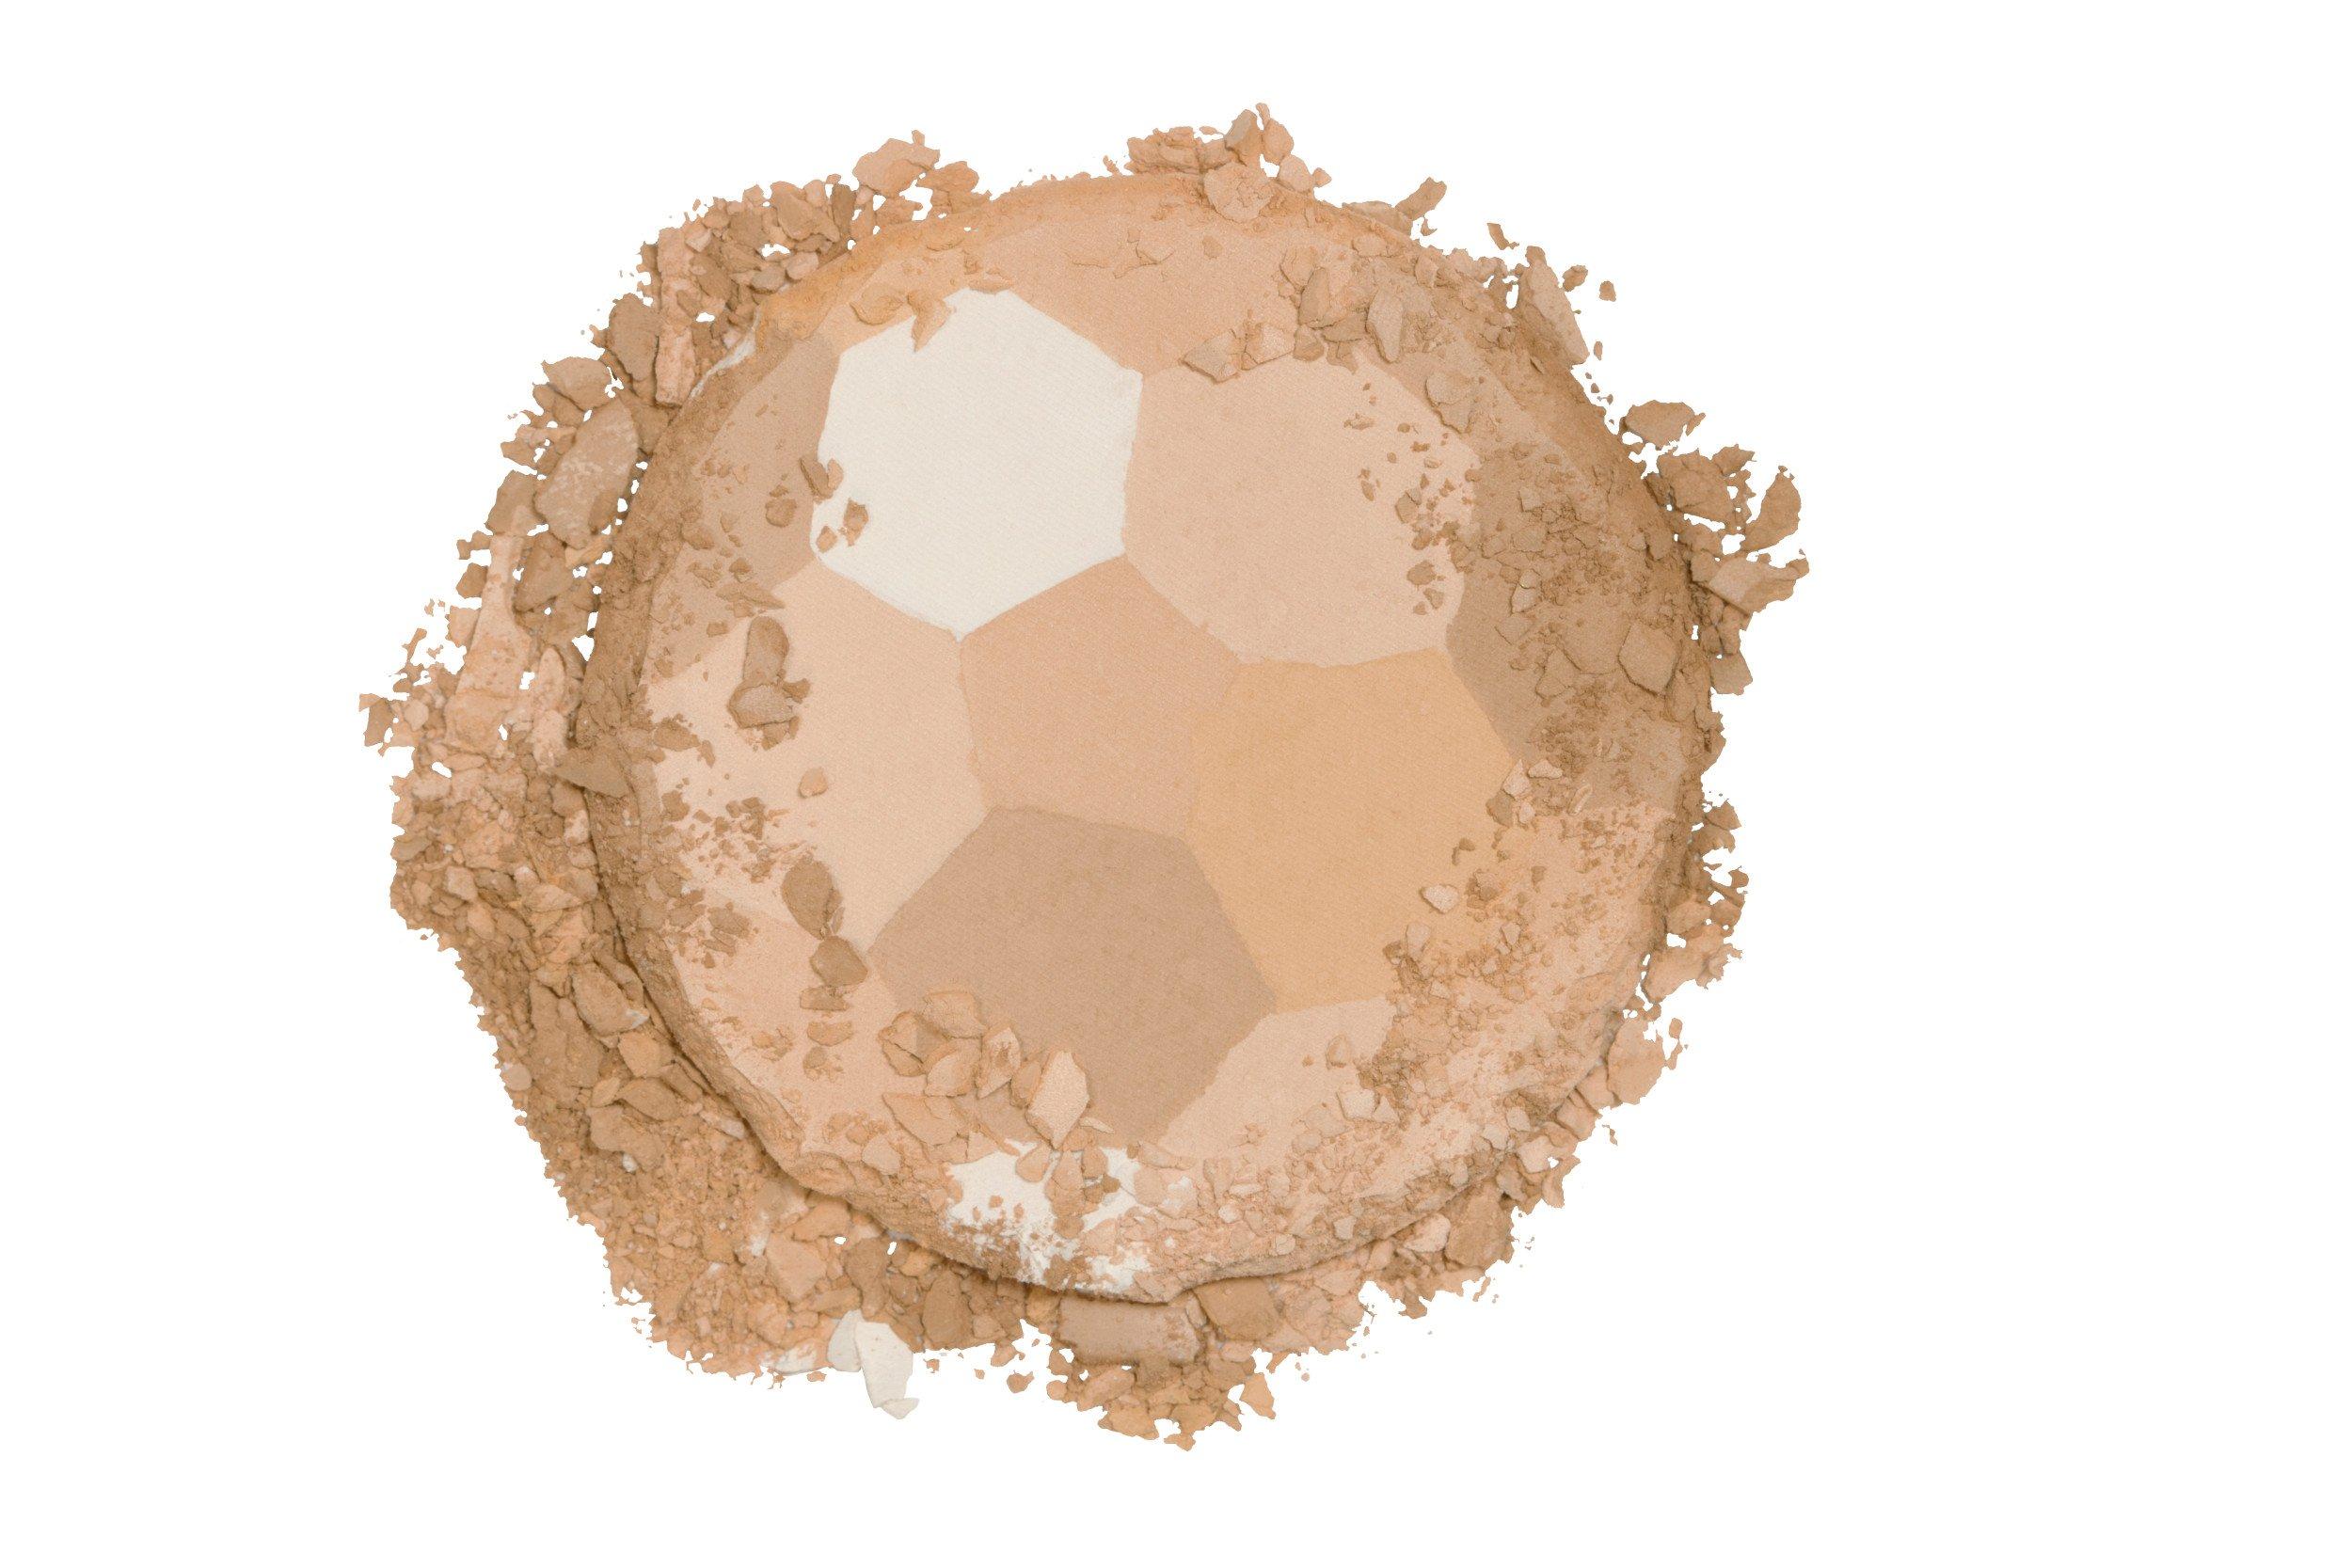 Physicians Formula Powder Palette Color Corrective Powders, Multi-colored Pressed Powder, Translucent, 0.3-Ounces by Physicians Formula (Image #2)